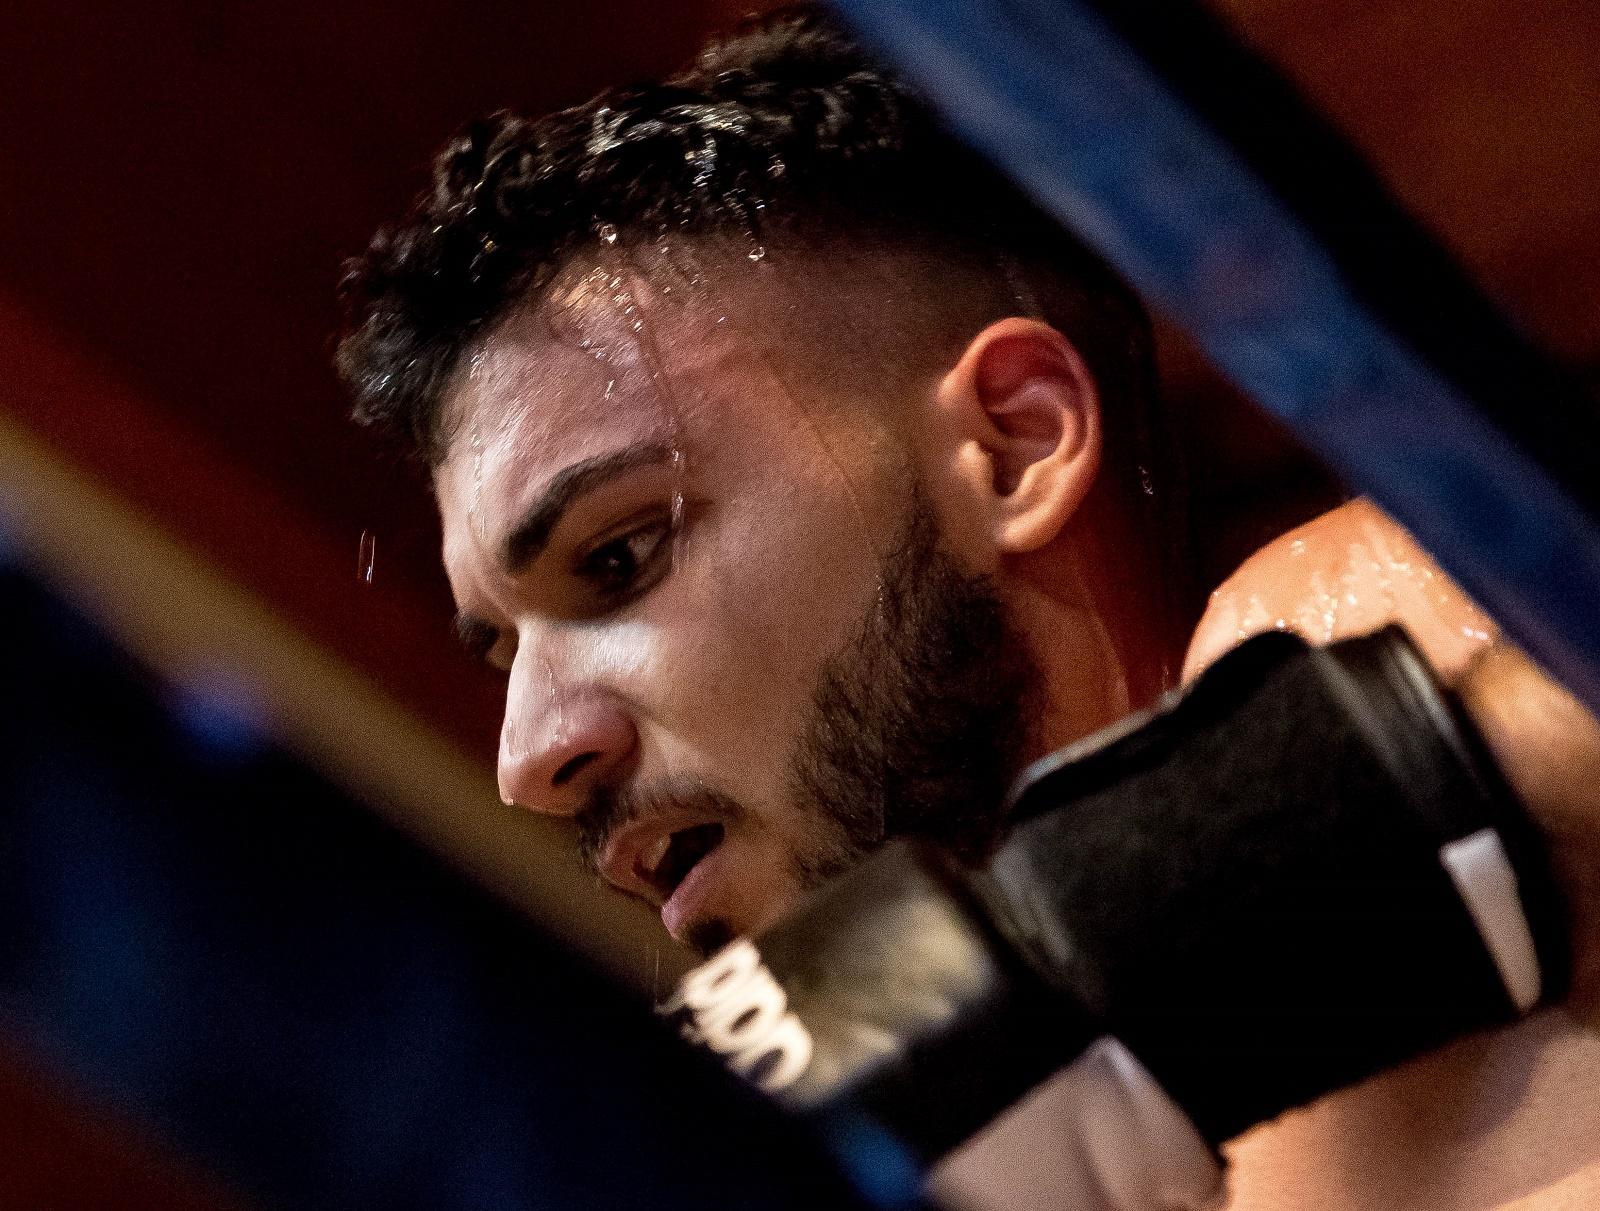 sm2016_kick-boxing_albin_asani_regiosport-1600